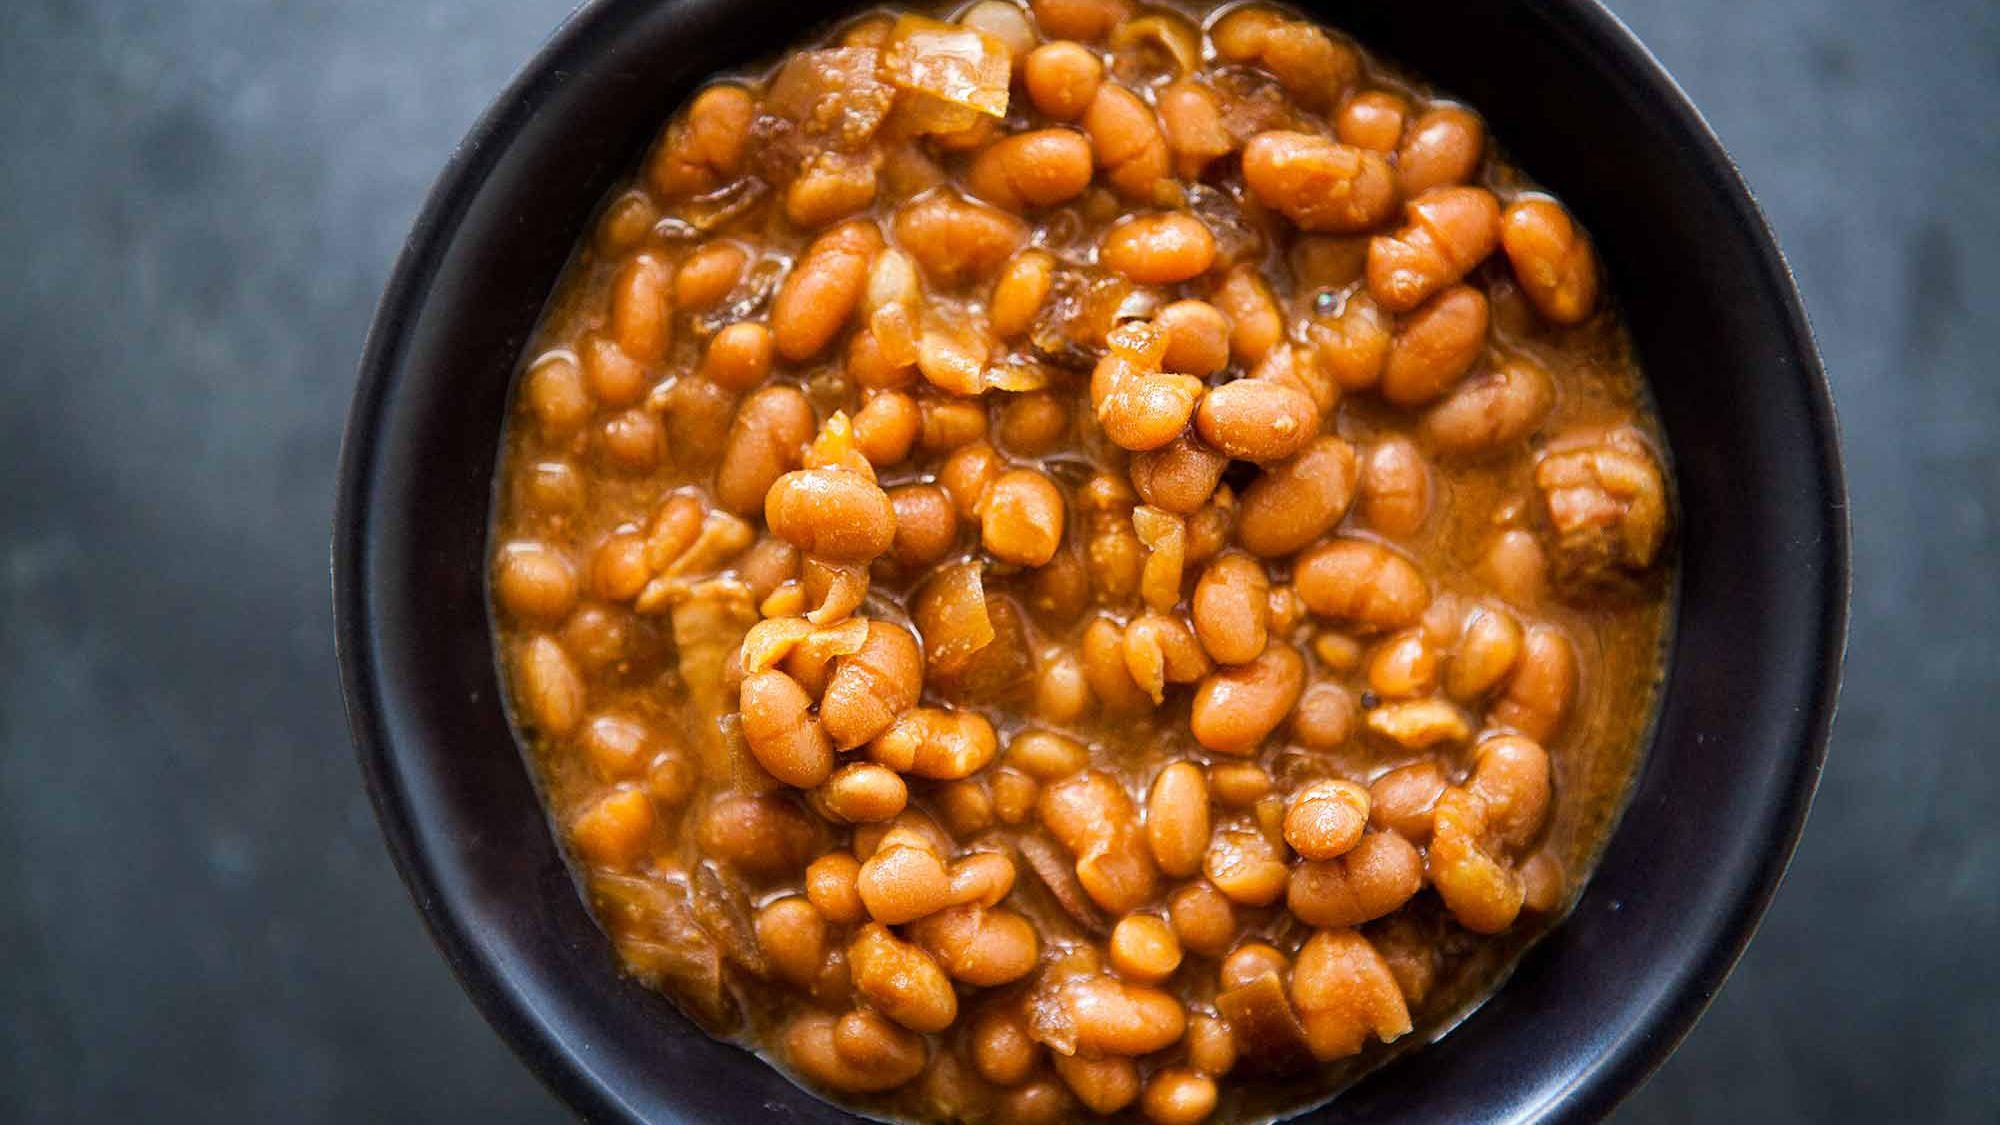 Boston Baked Beans Slow Cooker Recipe